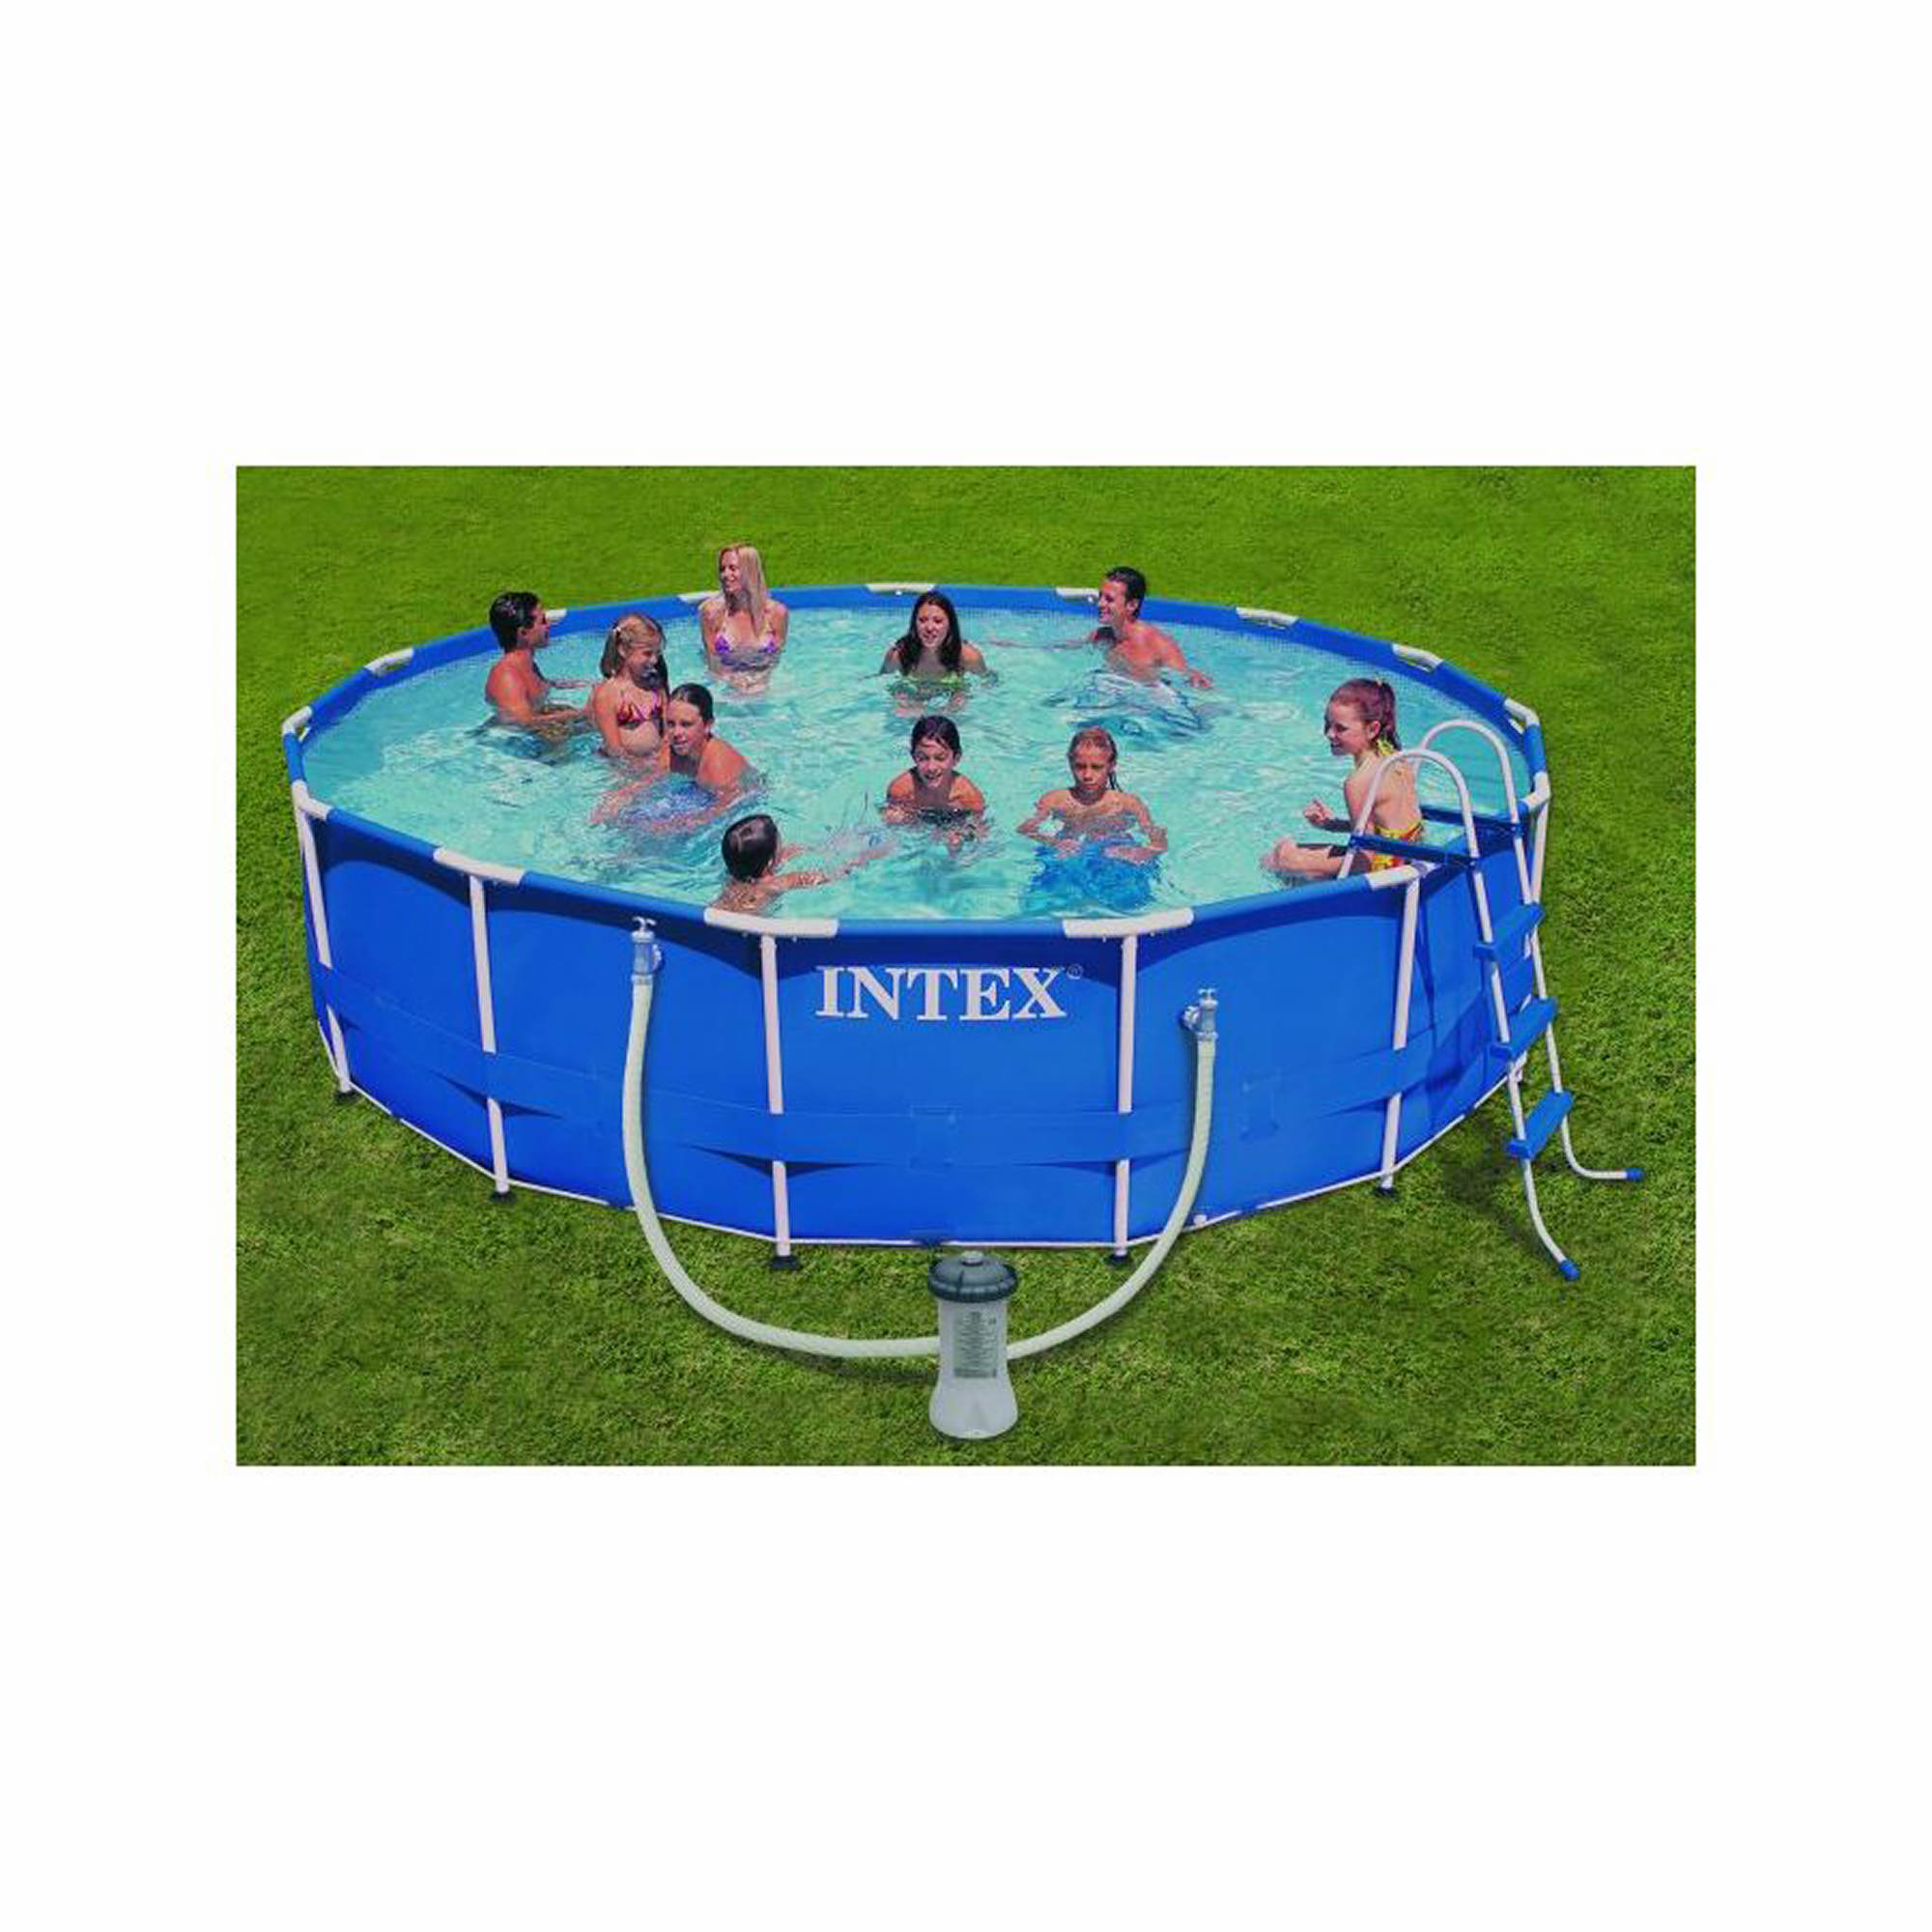 intex 15 x 42 round aboveground metal frame pool